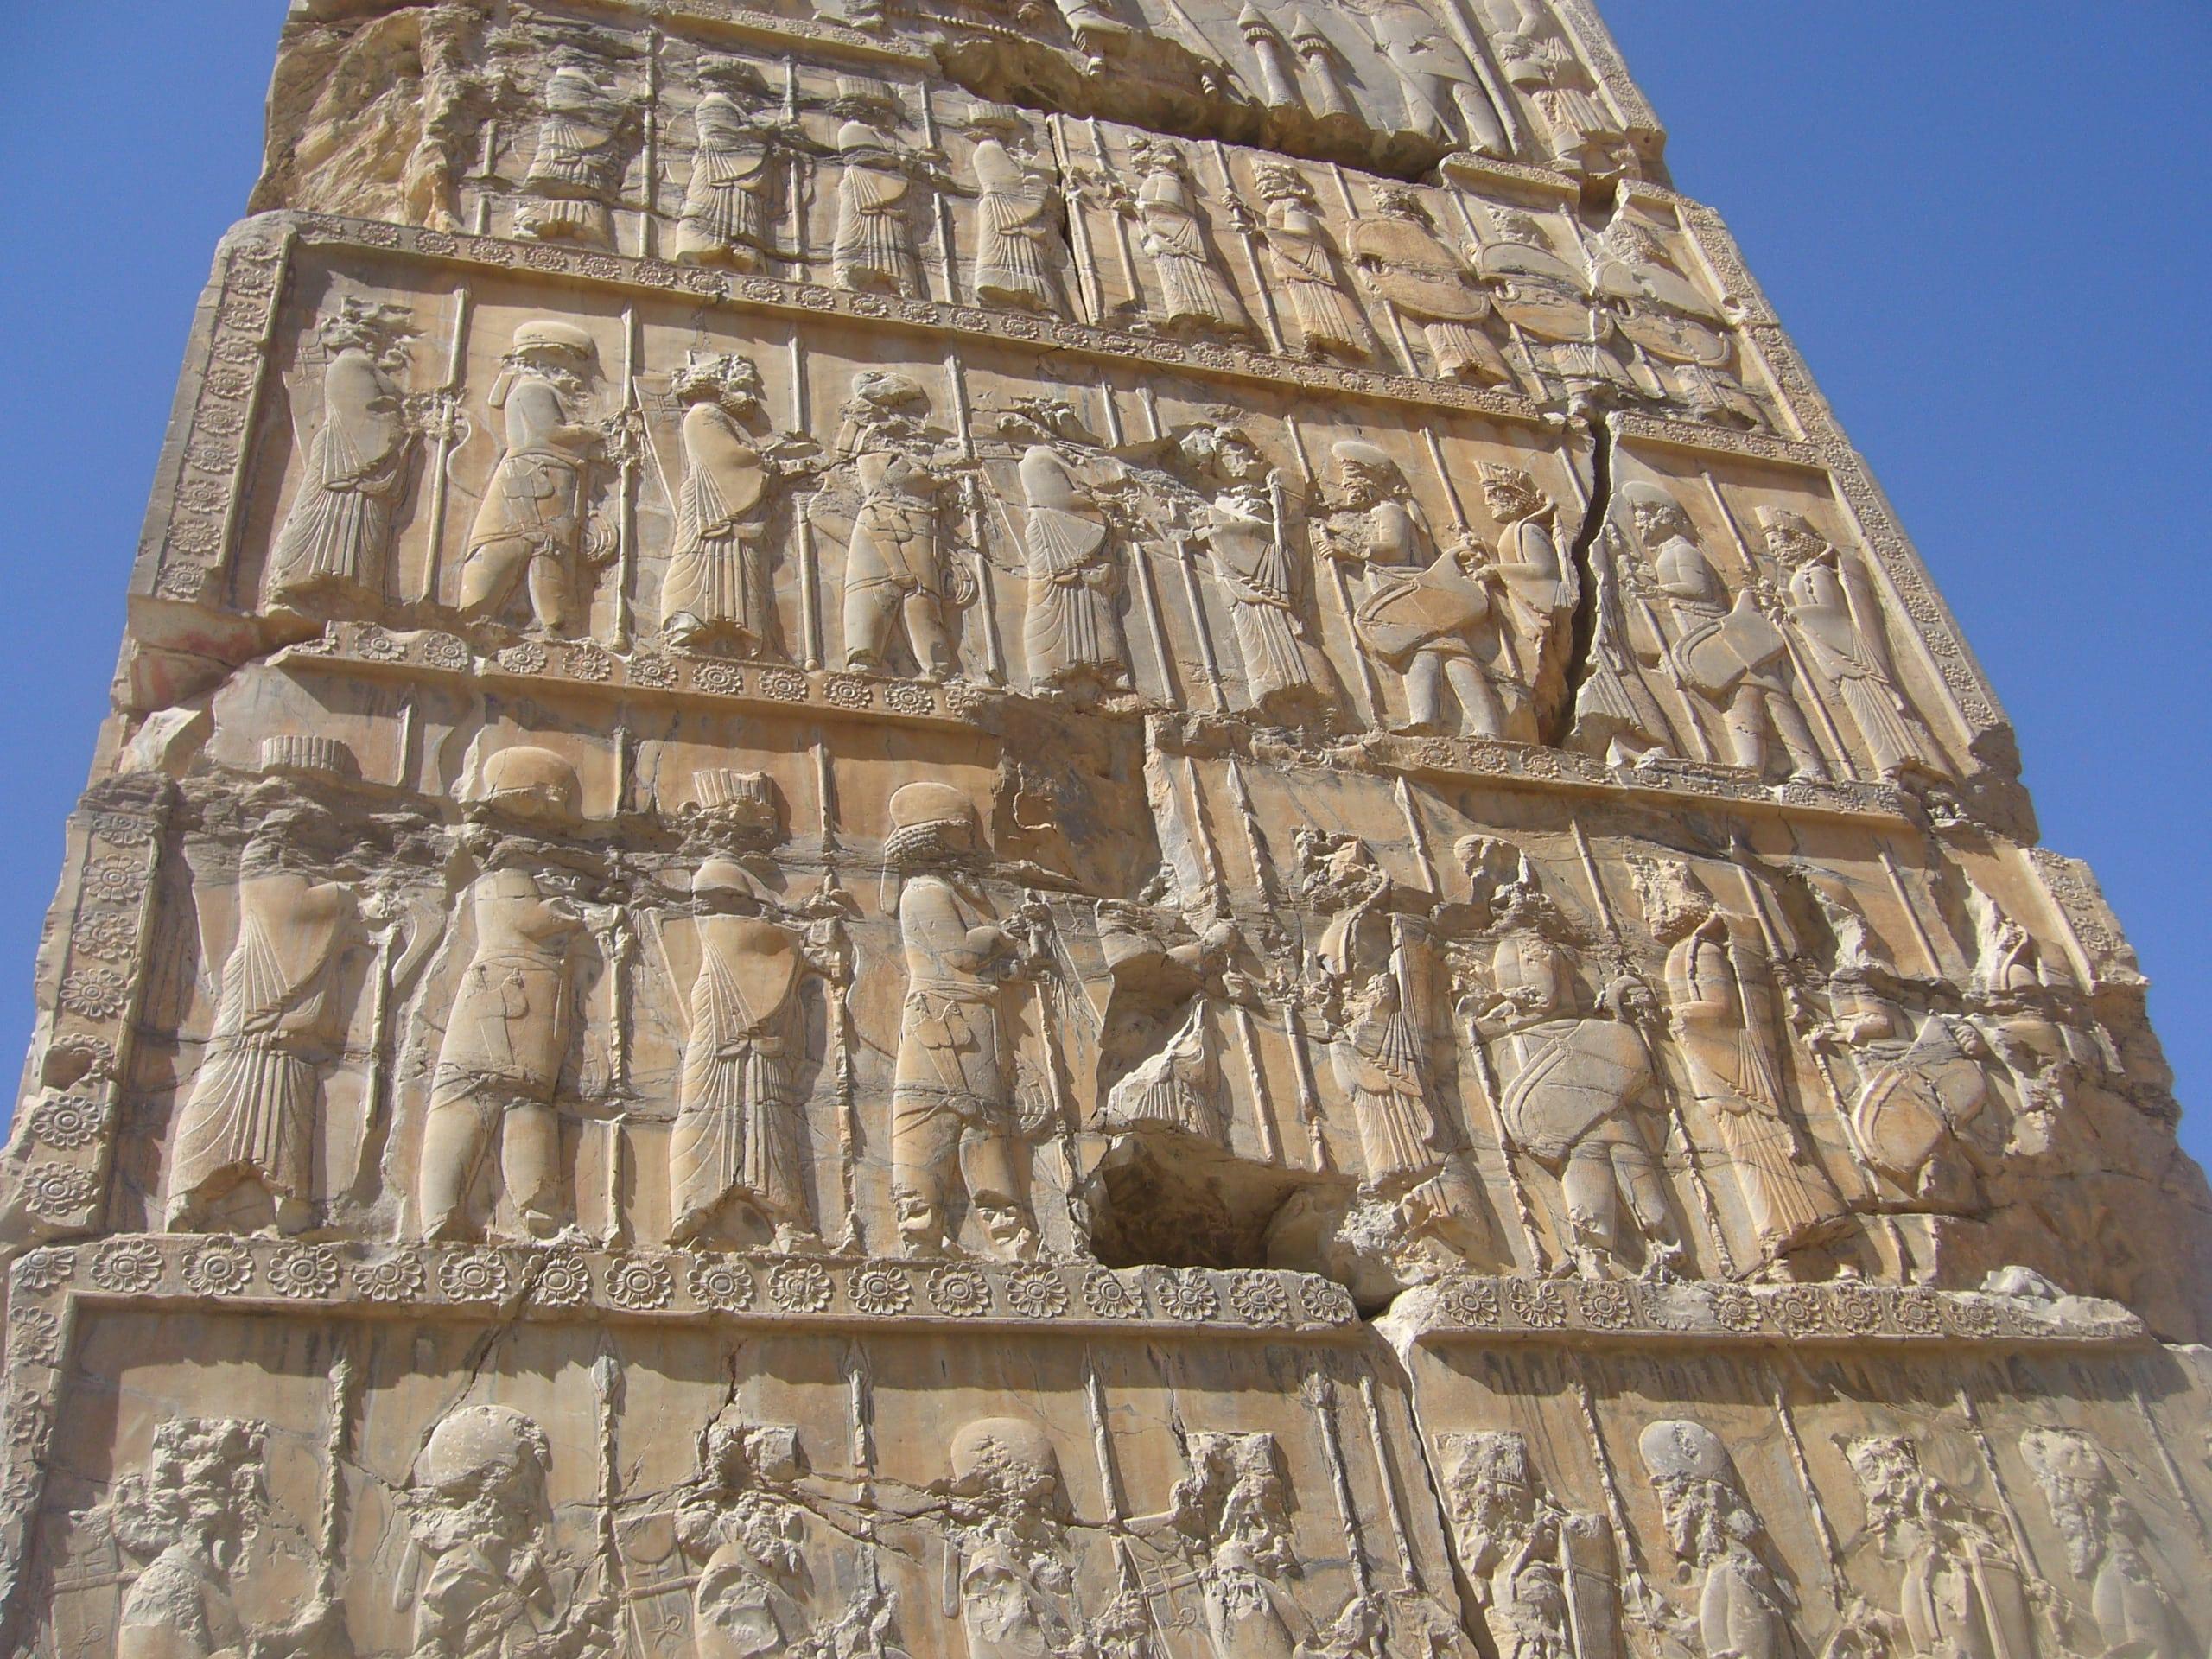 Persepolis Stone Reliefs